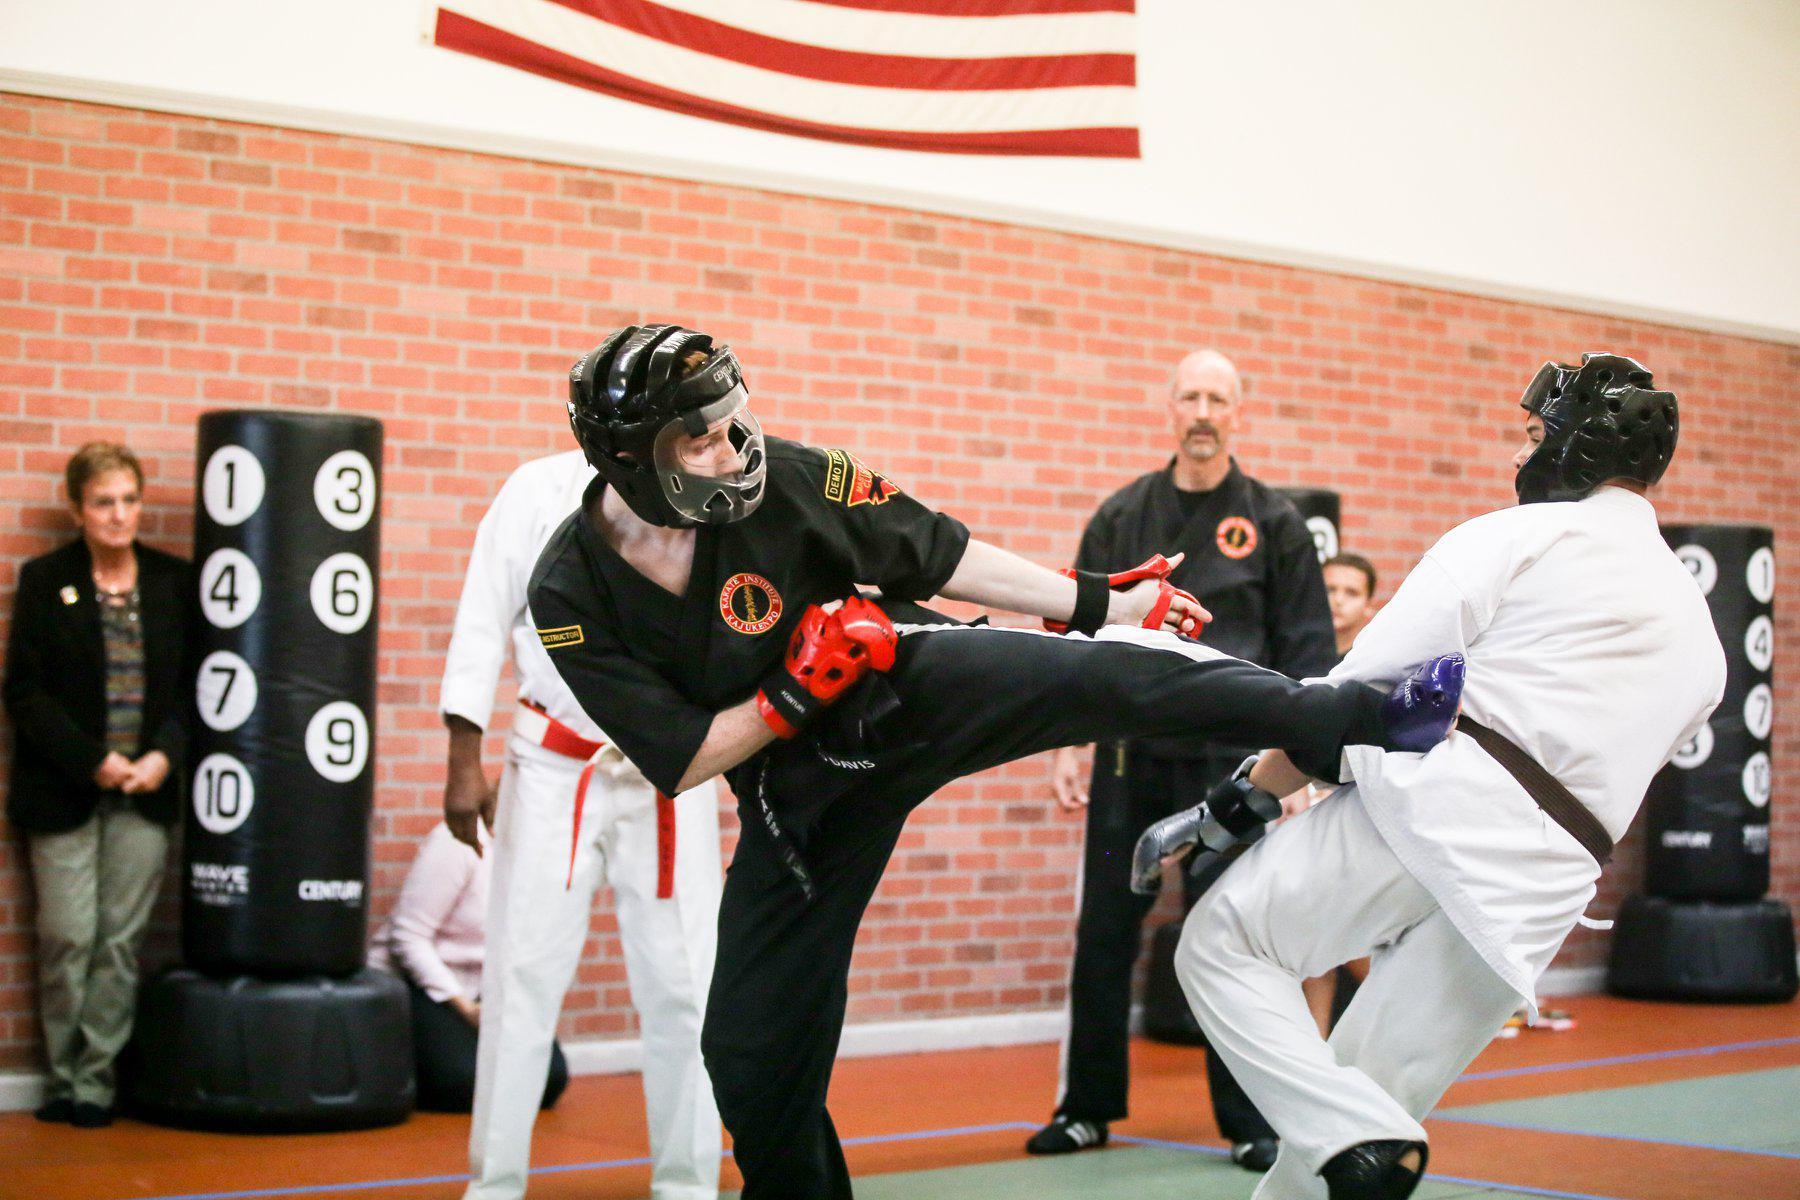 Karate Institute of Mentor